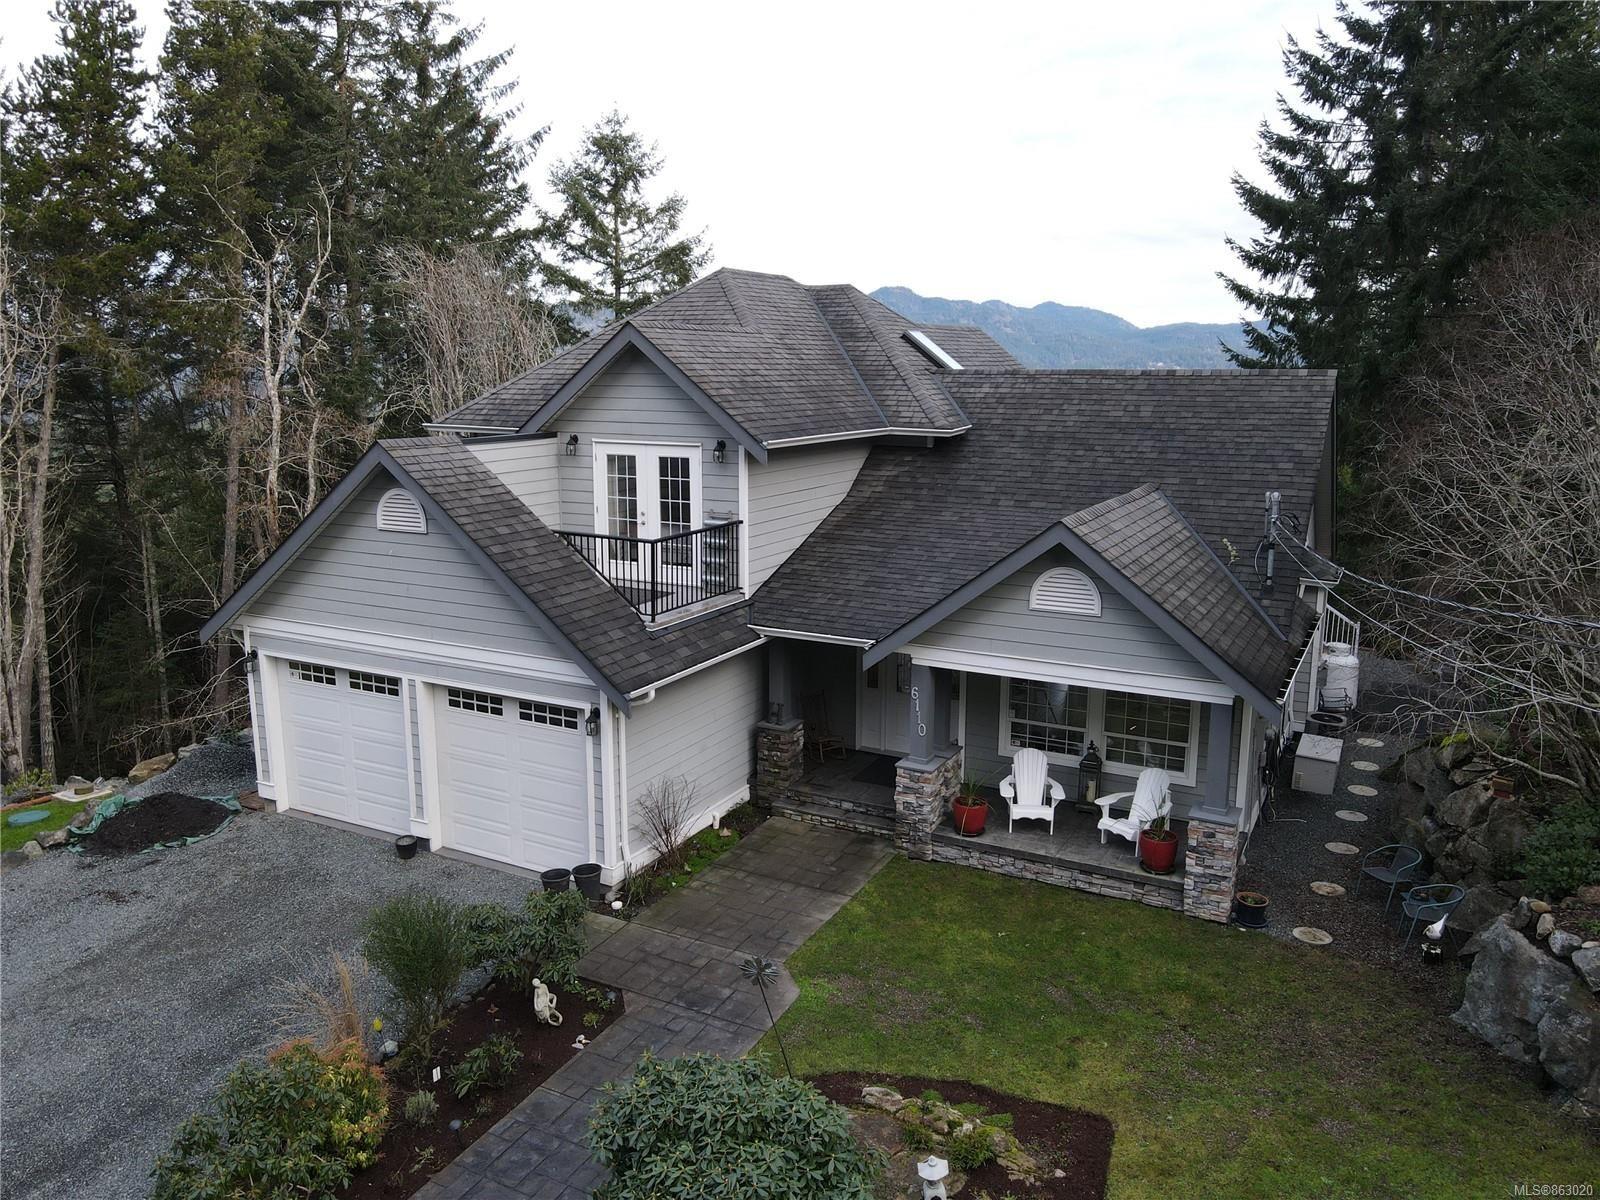 Main Photo: 6110 Copper View Lane in : Sk East Sooke House for sale (Sooke)  : MLS®# 863020